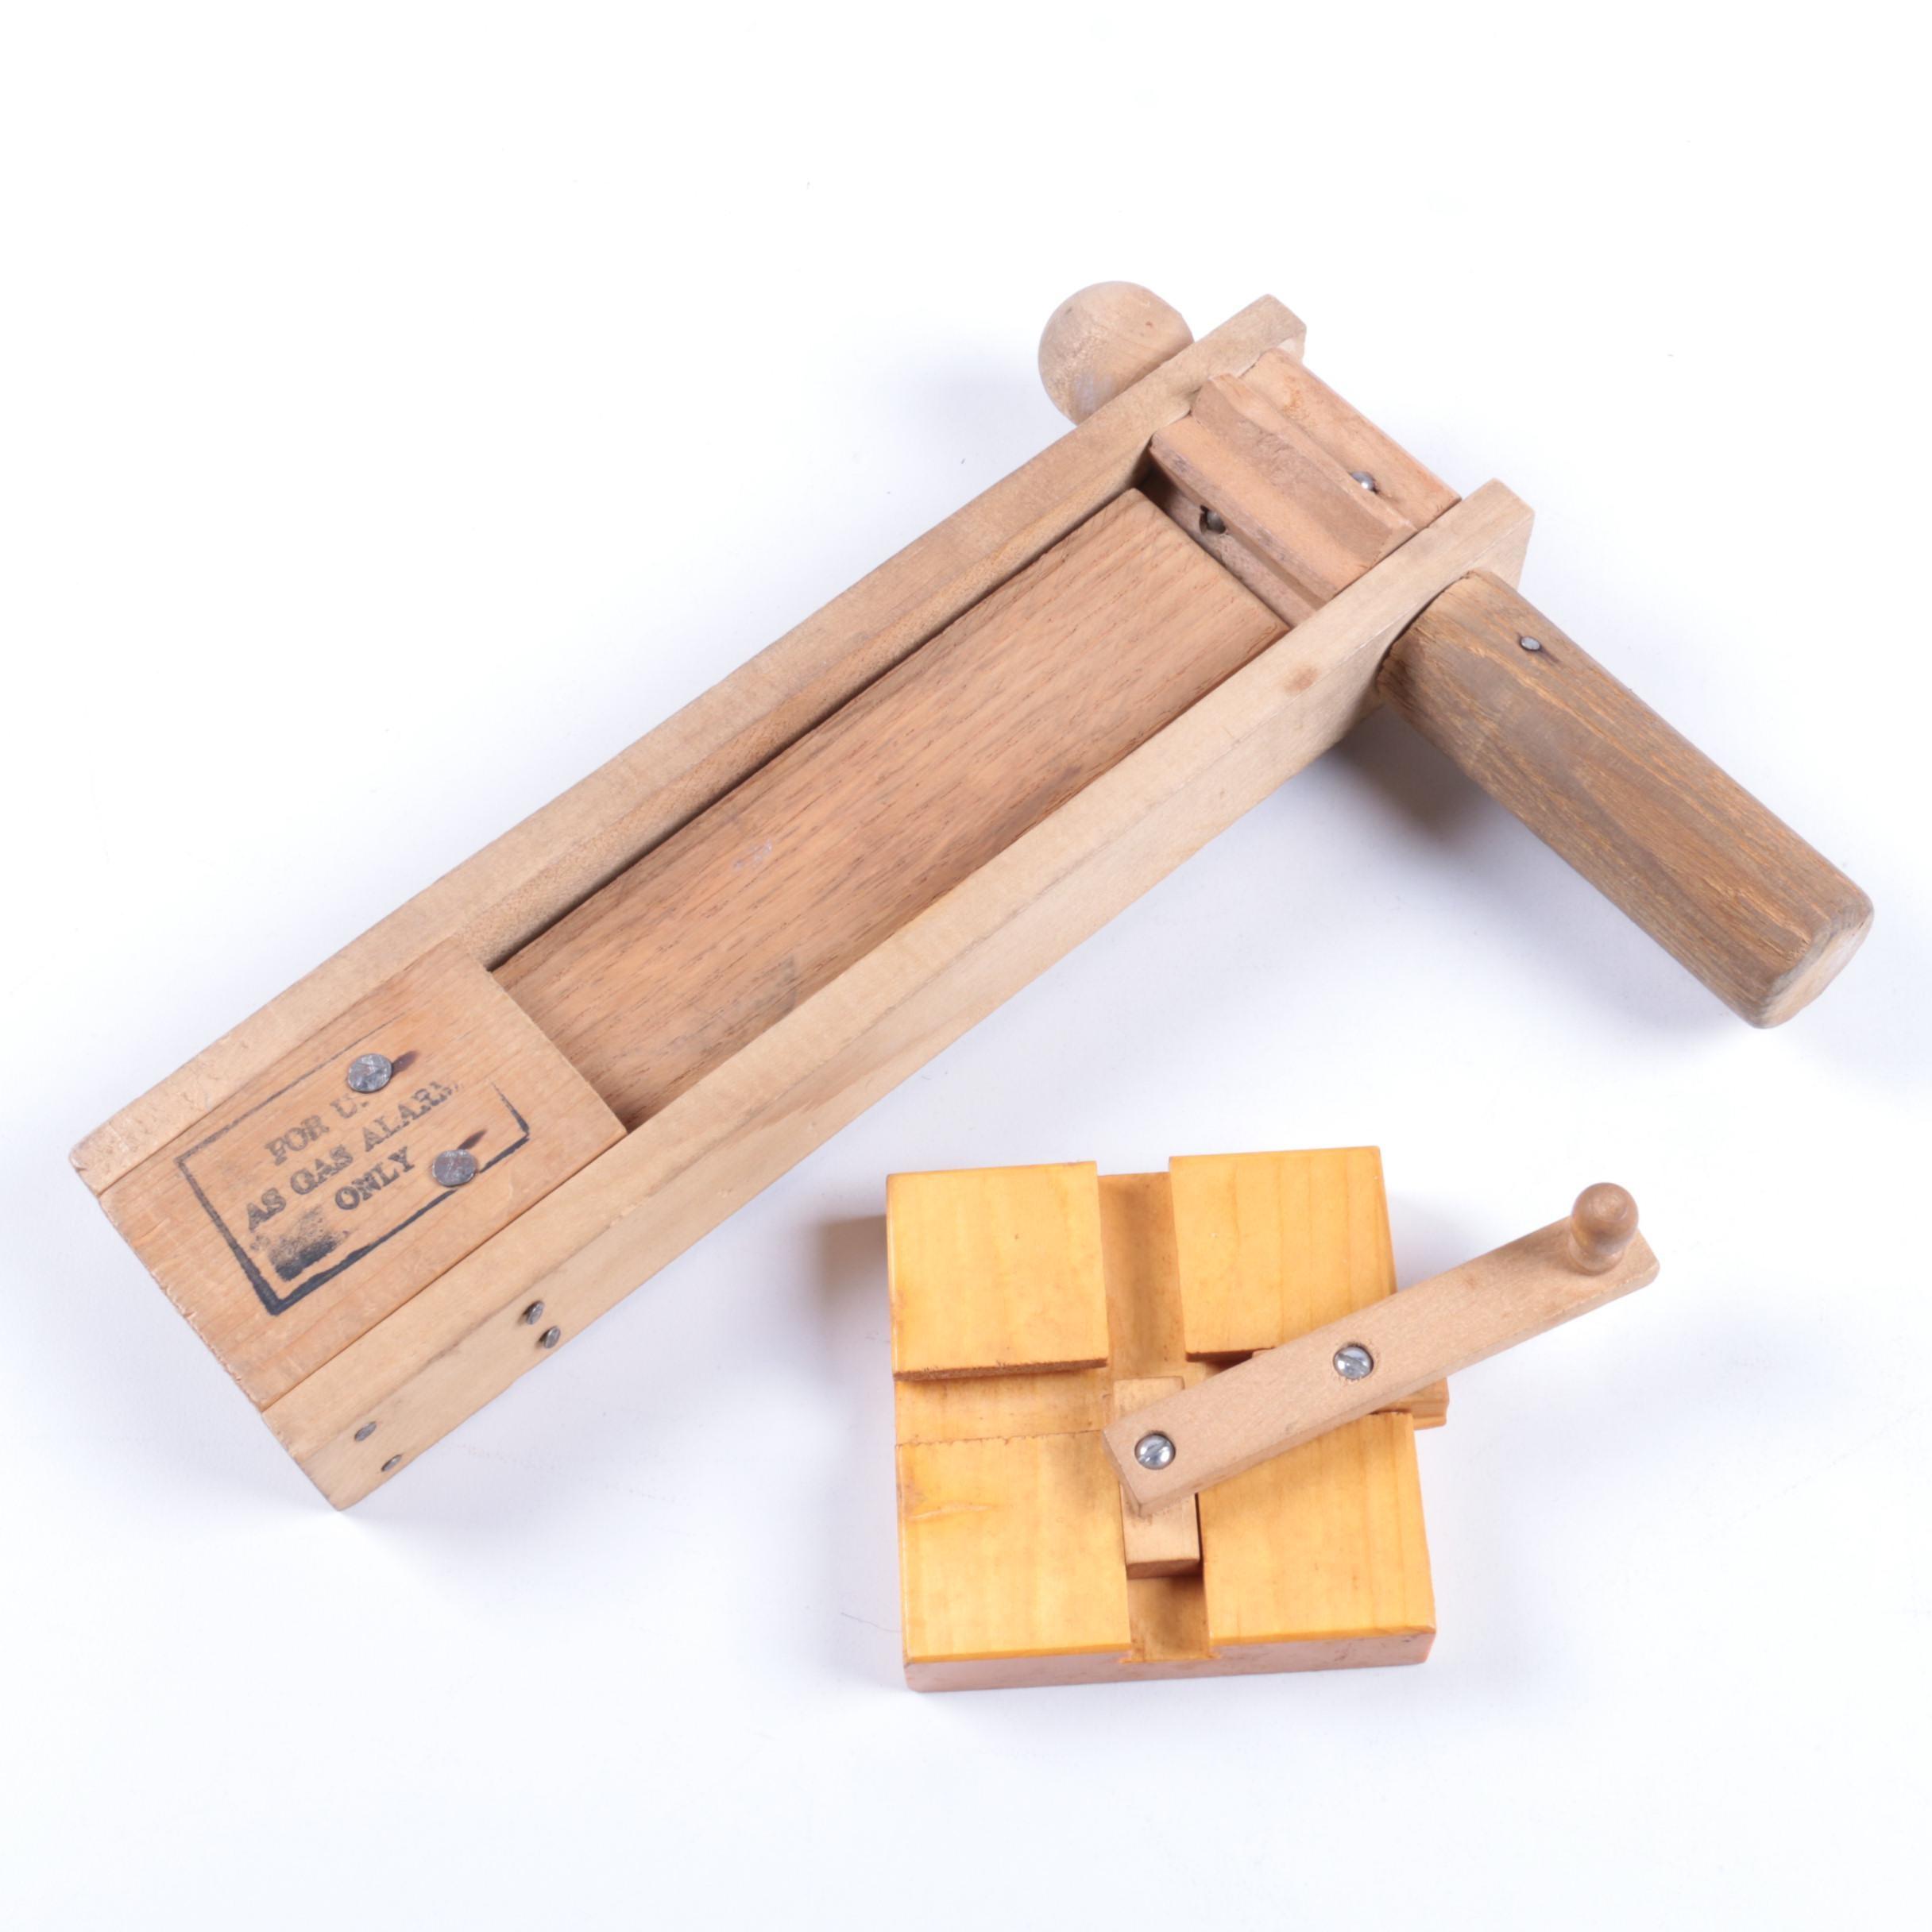 Vintage Wooden Gas Alarm Rattle and B.S. Grinder